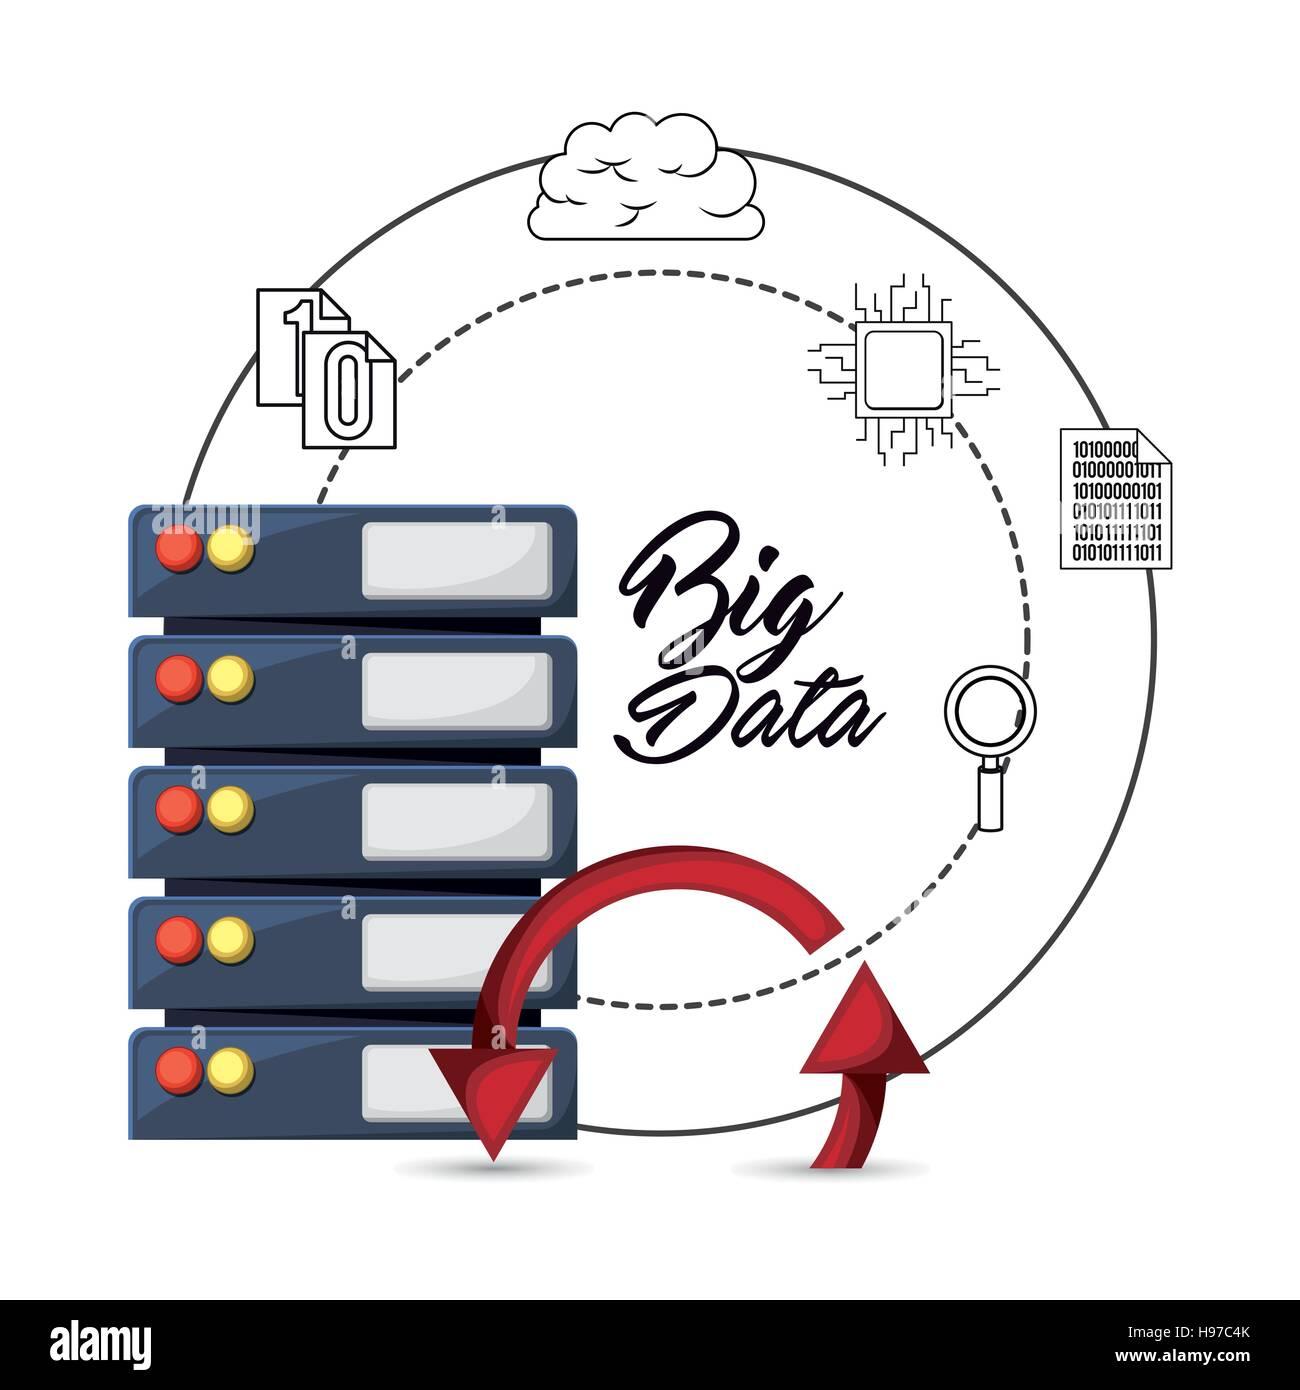 big data related icons image - Stock Image